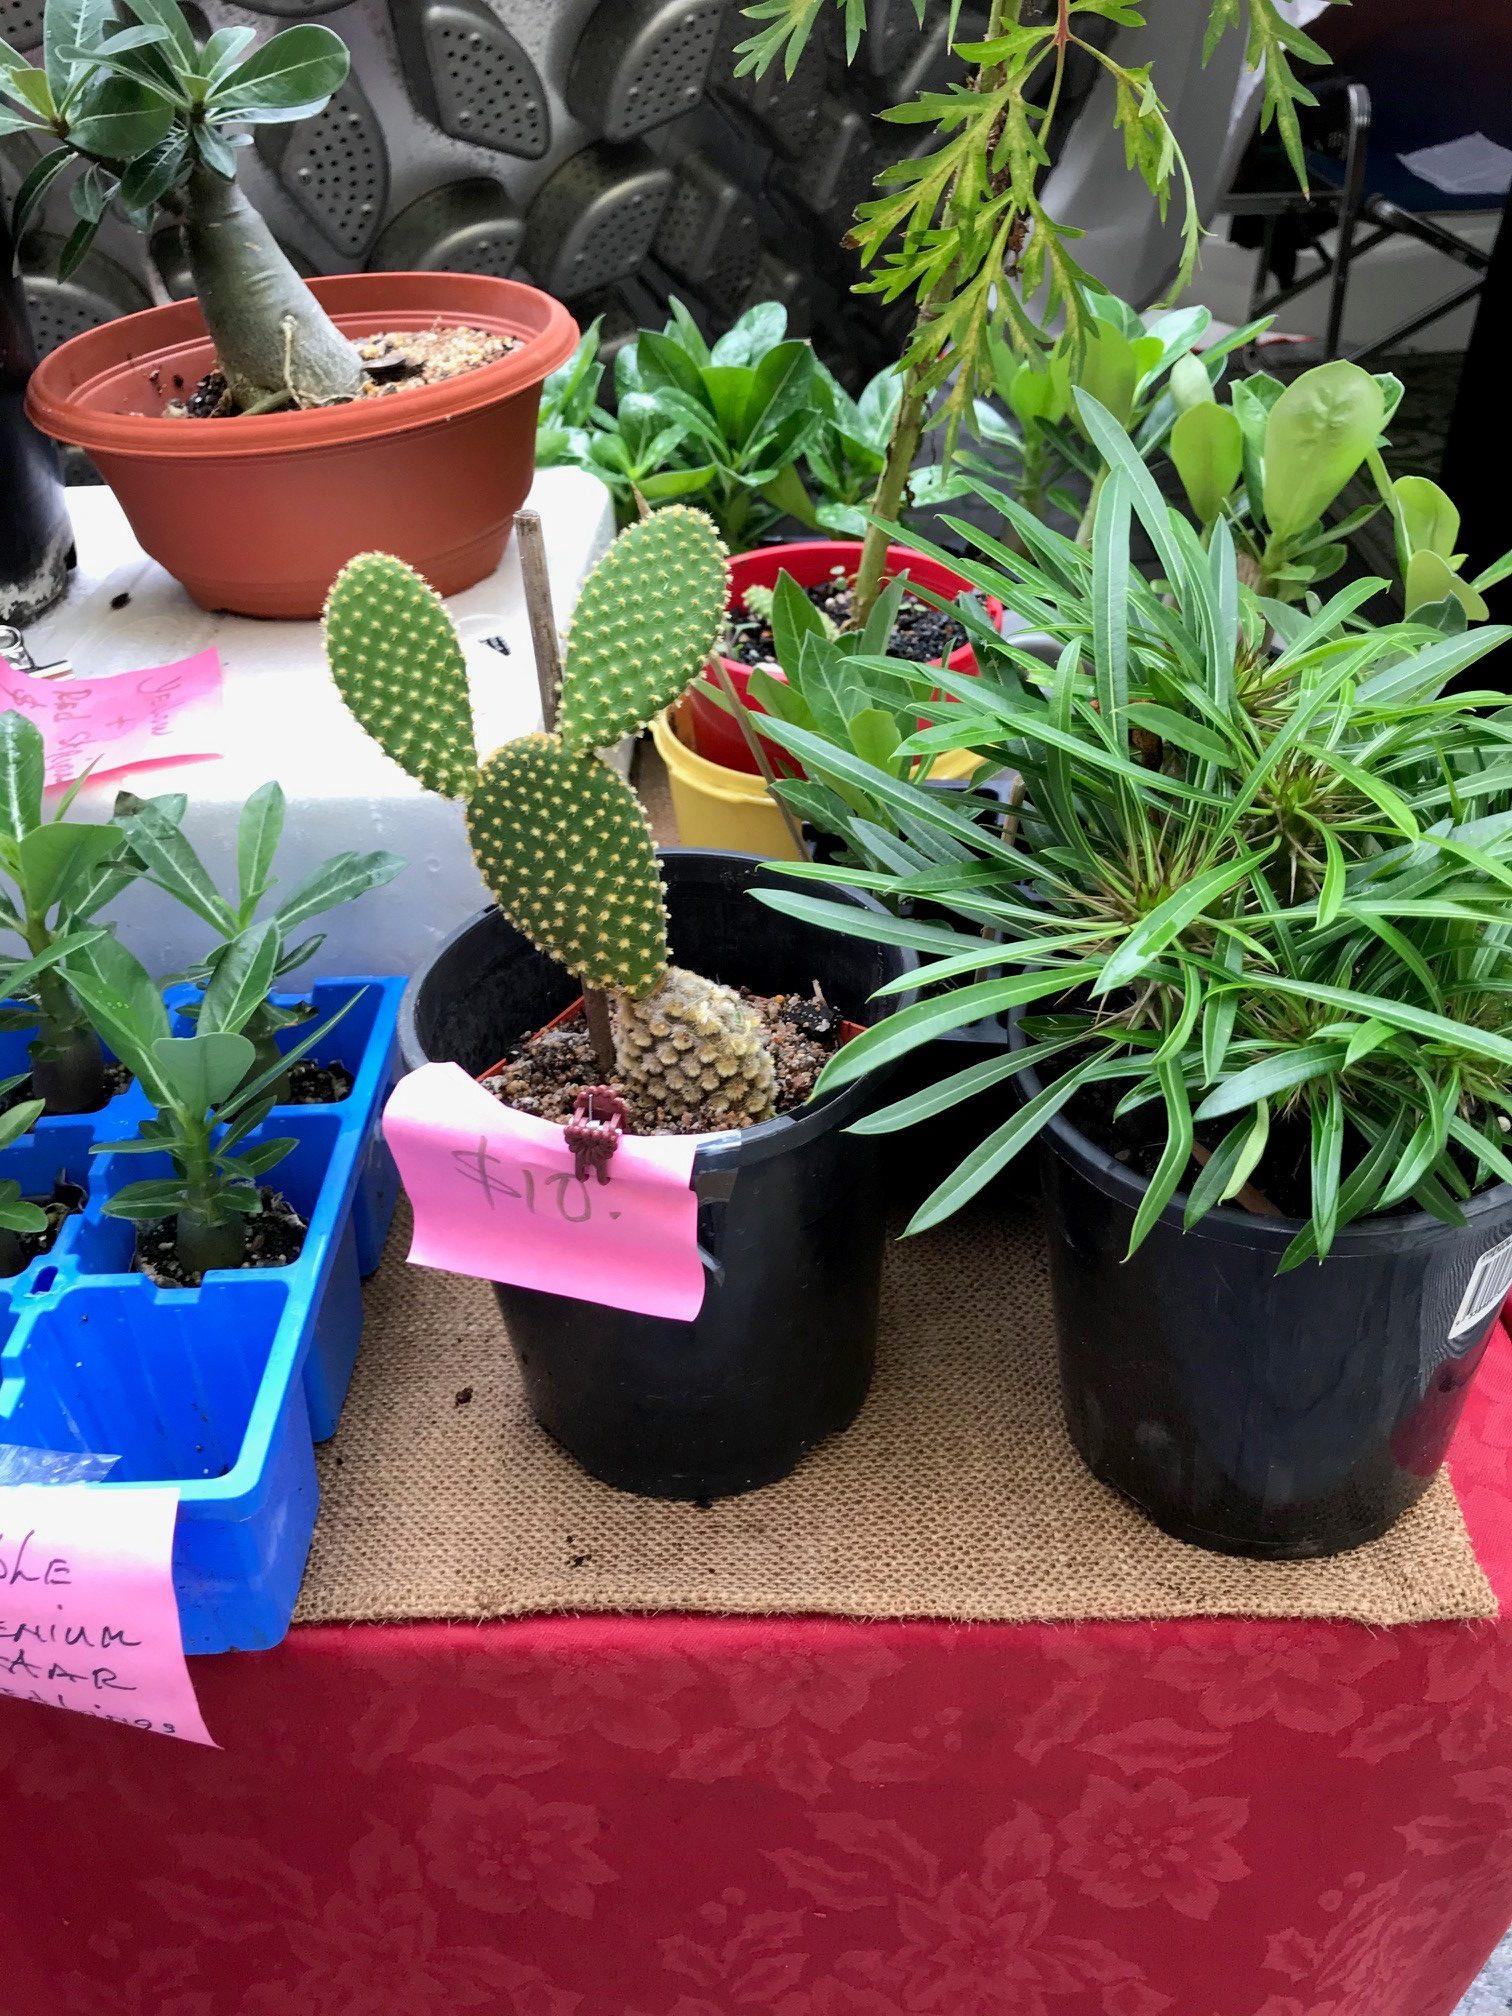 Brisbane's pest plant black market